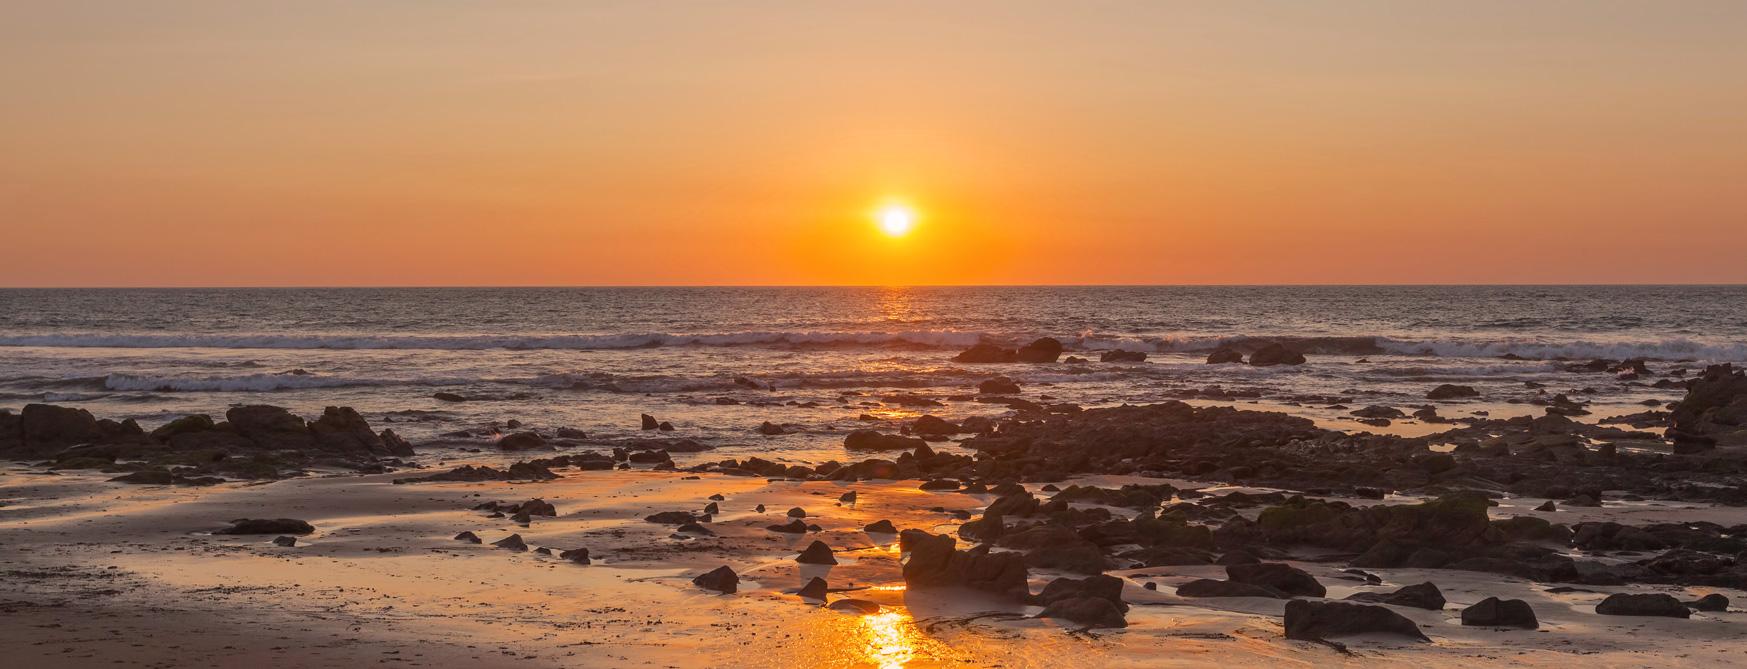 Santa Marianita Beach Sunset